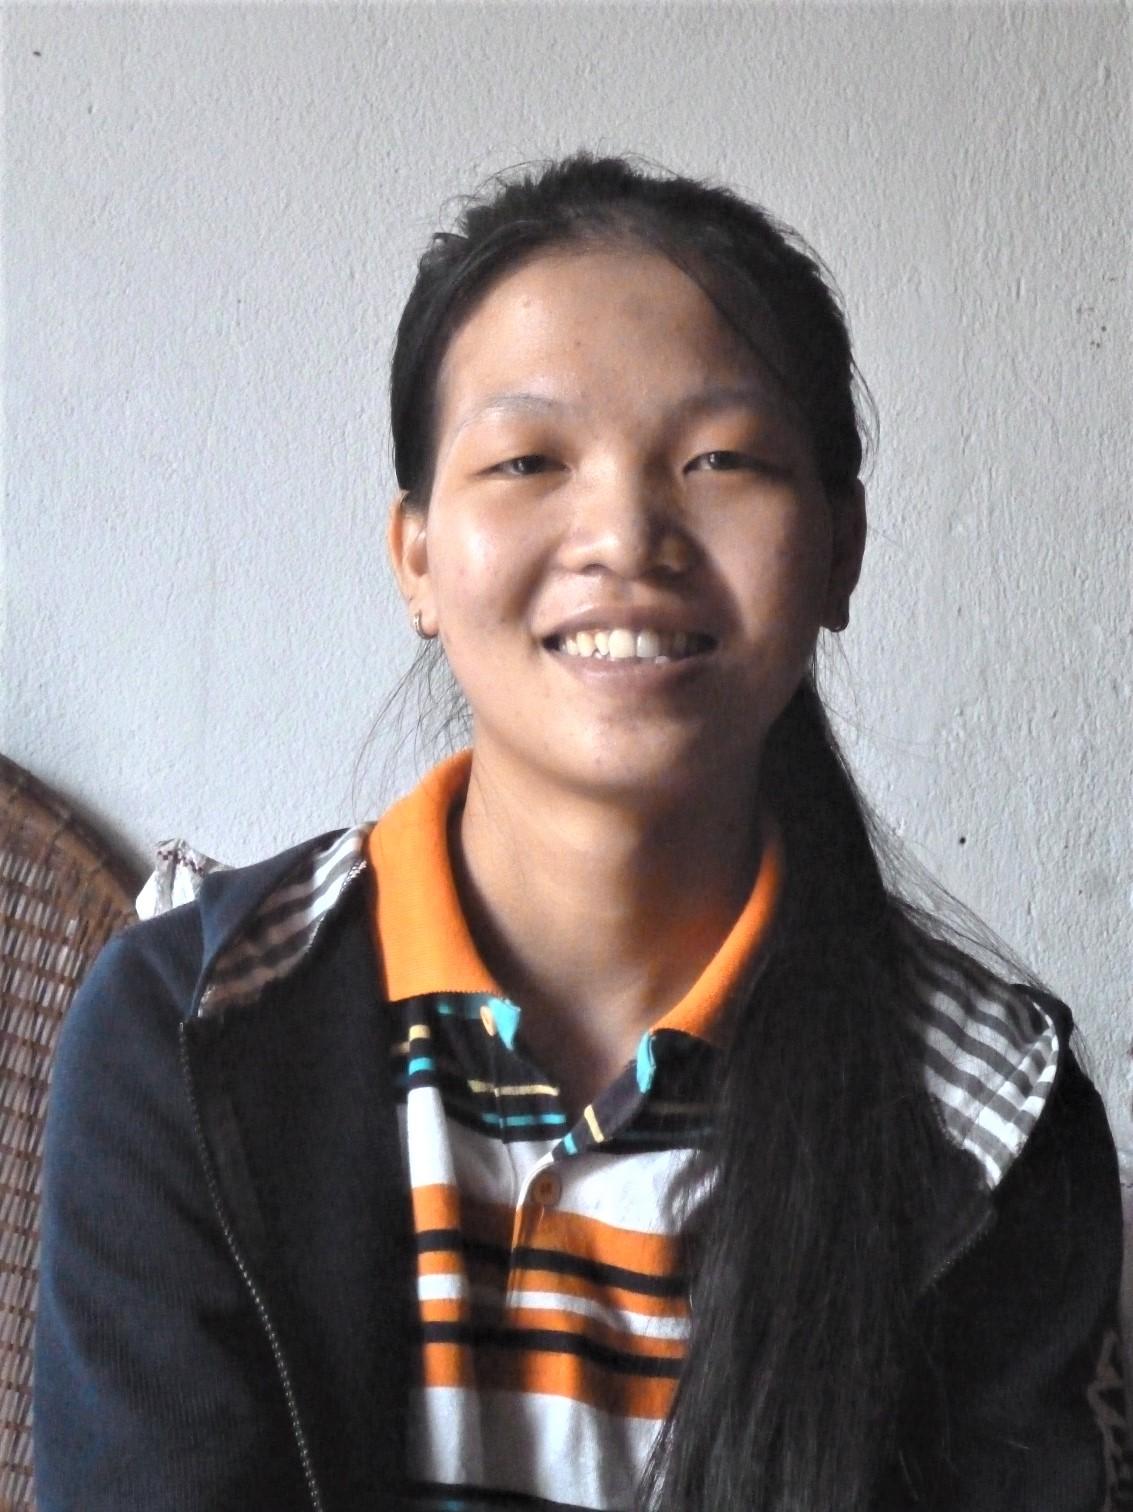 Nguyen-Thi-Thien-Term-1-2018-2019-to-send